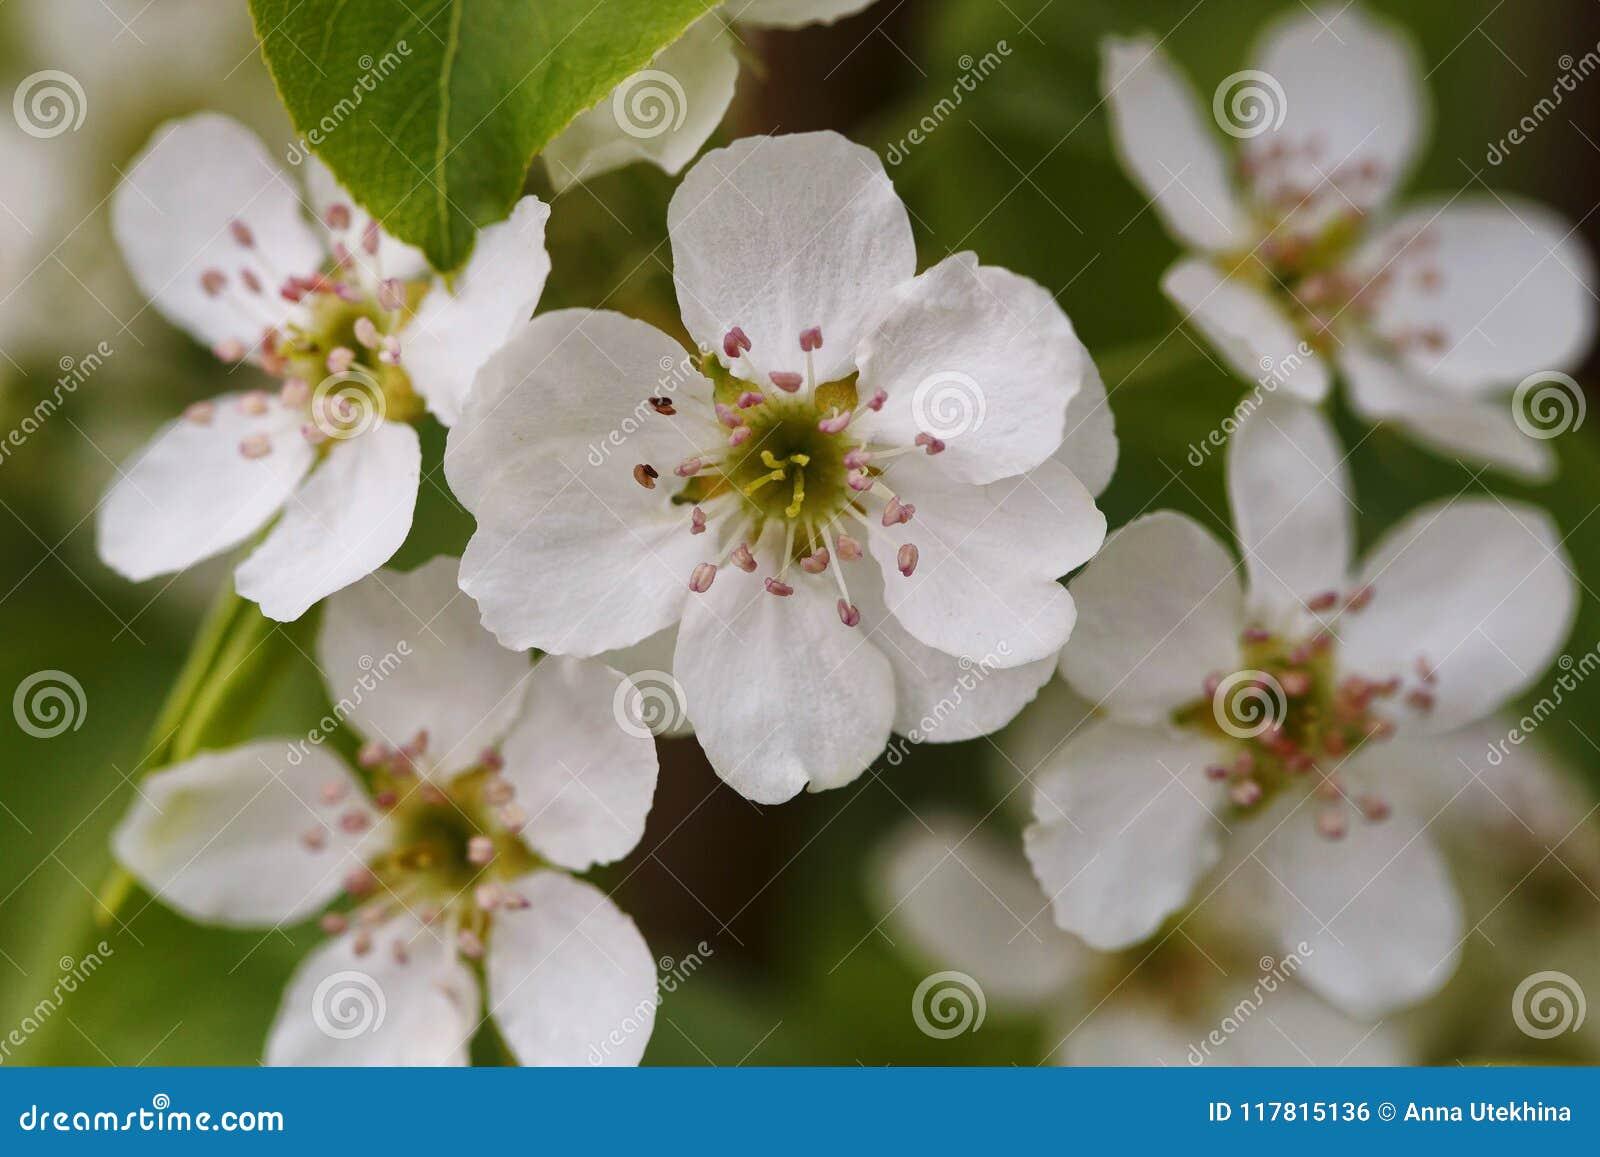 Cierre de la flor del peral del flor para arriba